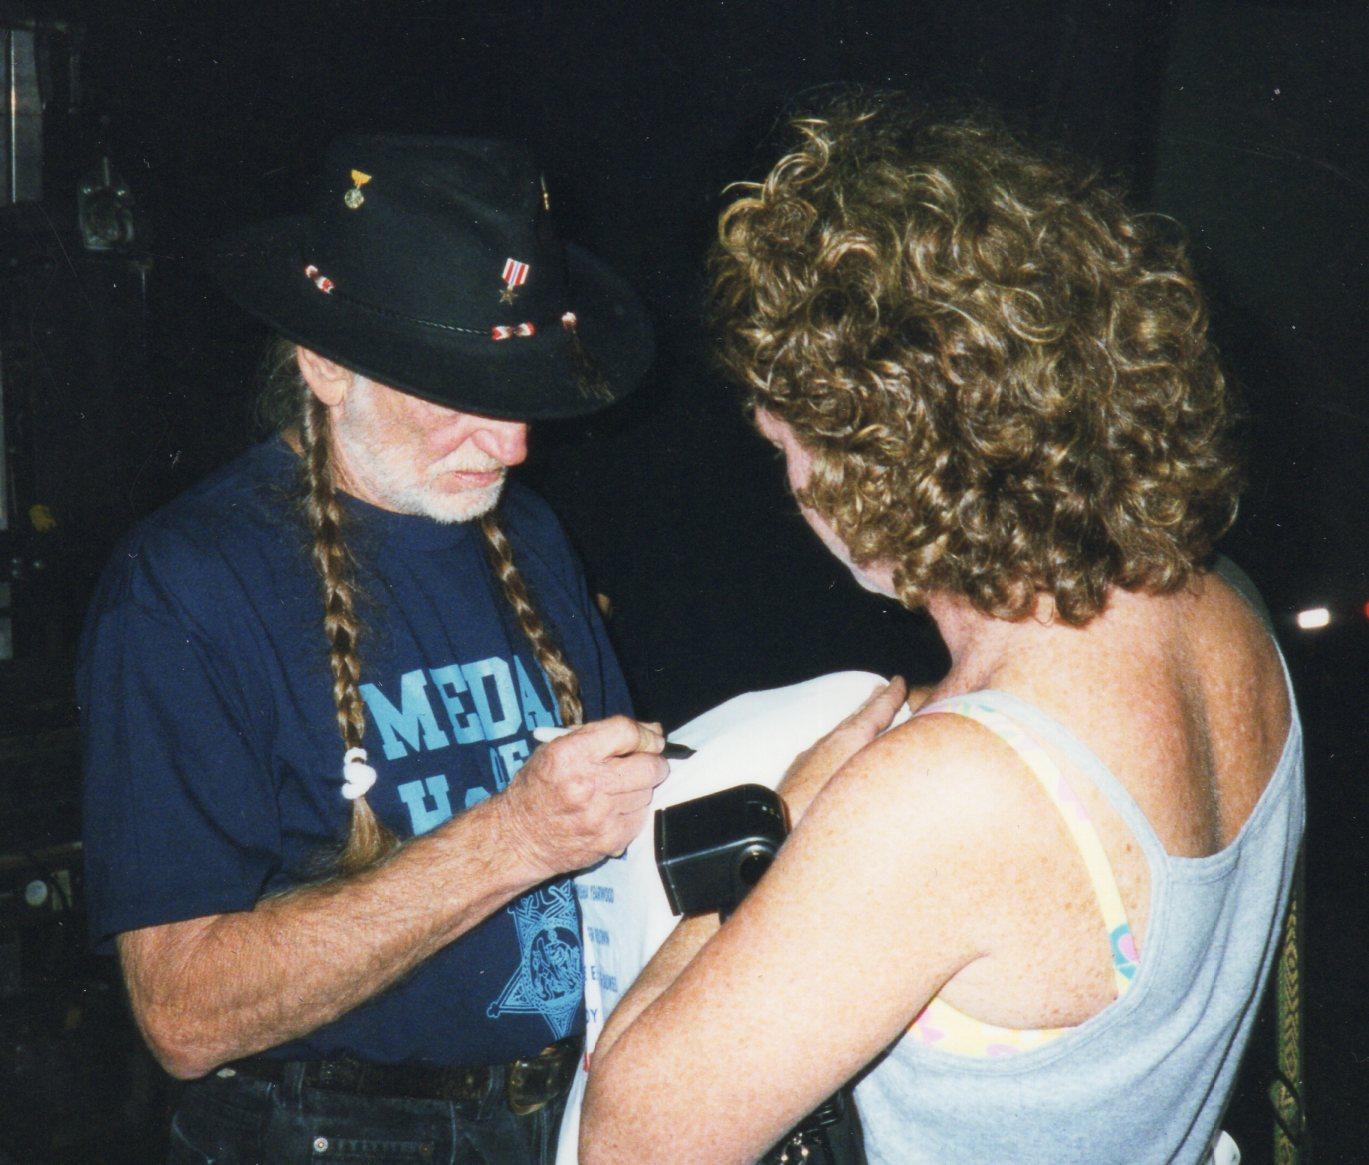 Willie Nelson & Kathy Gillis